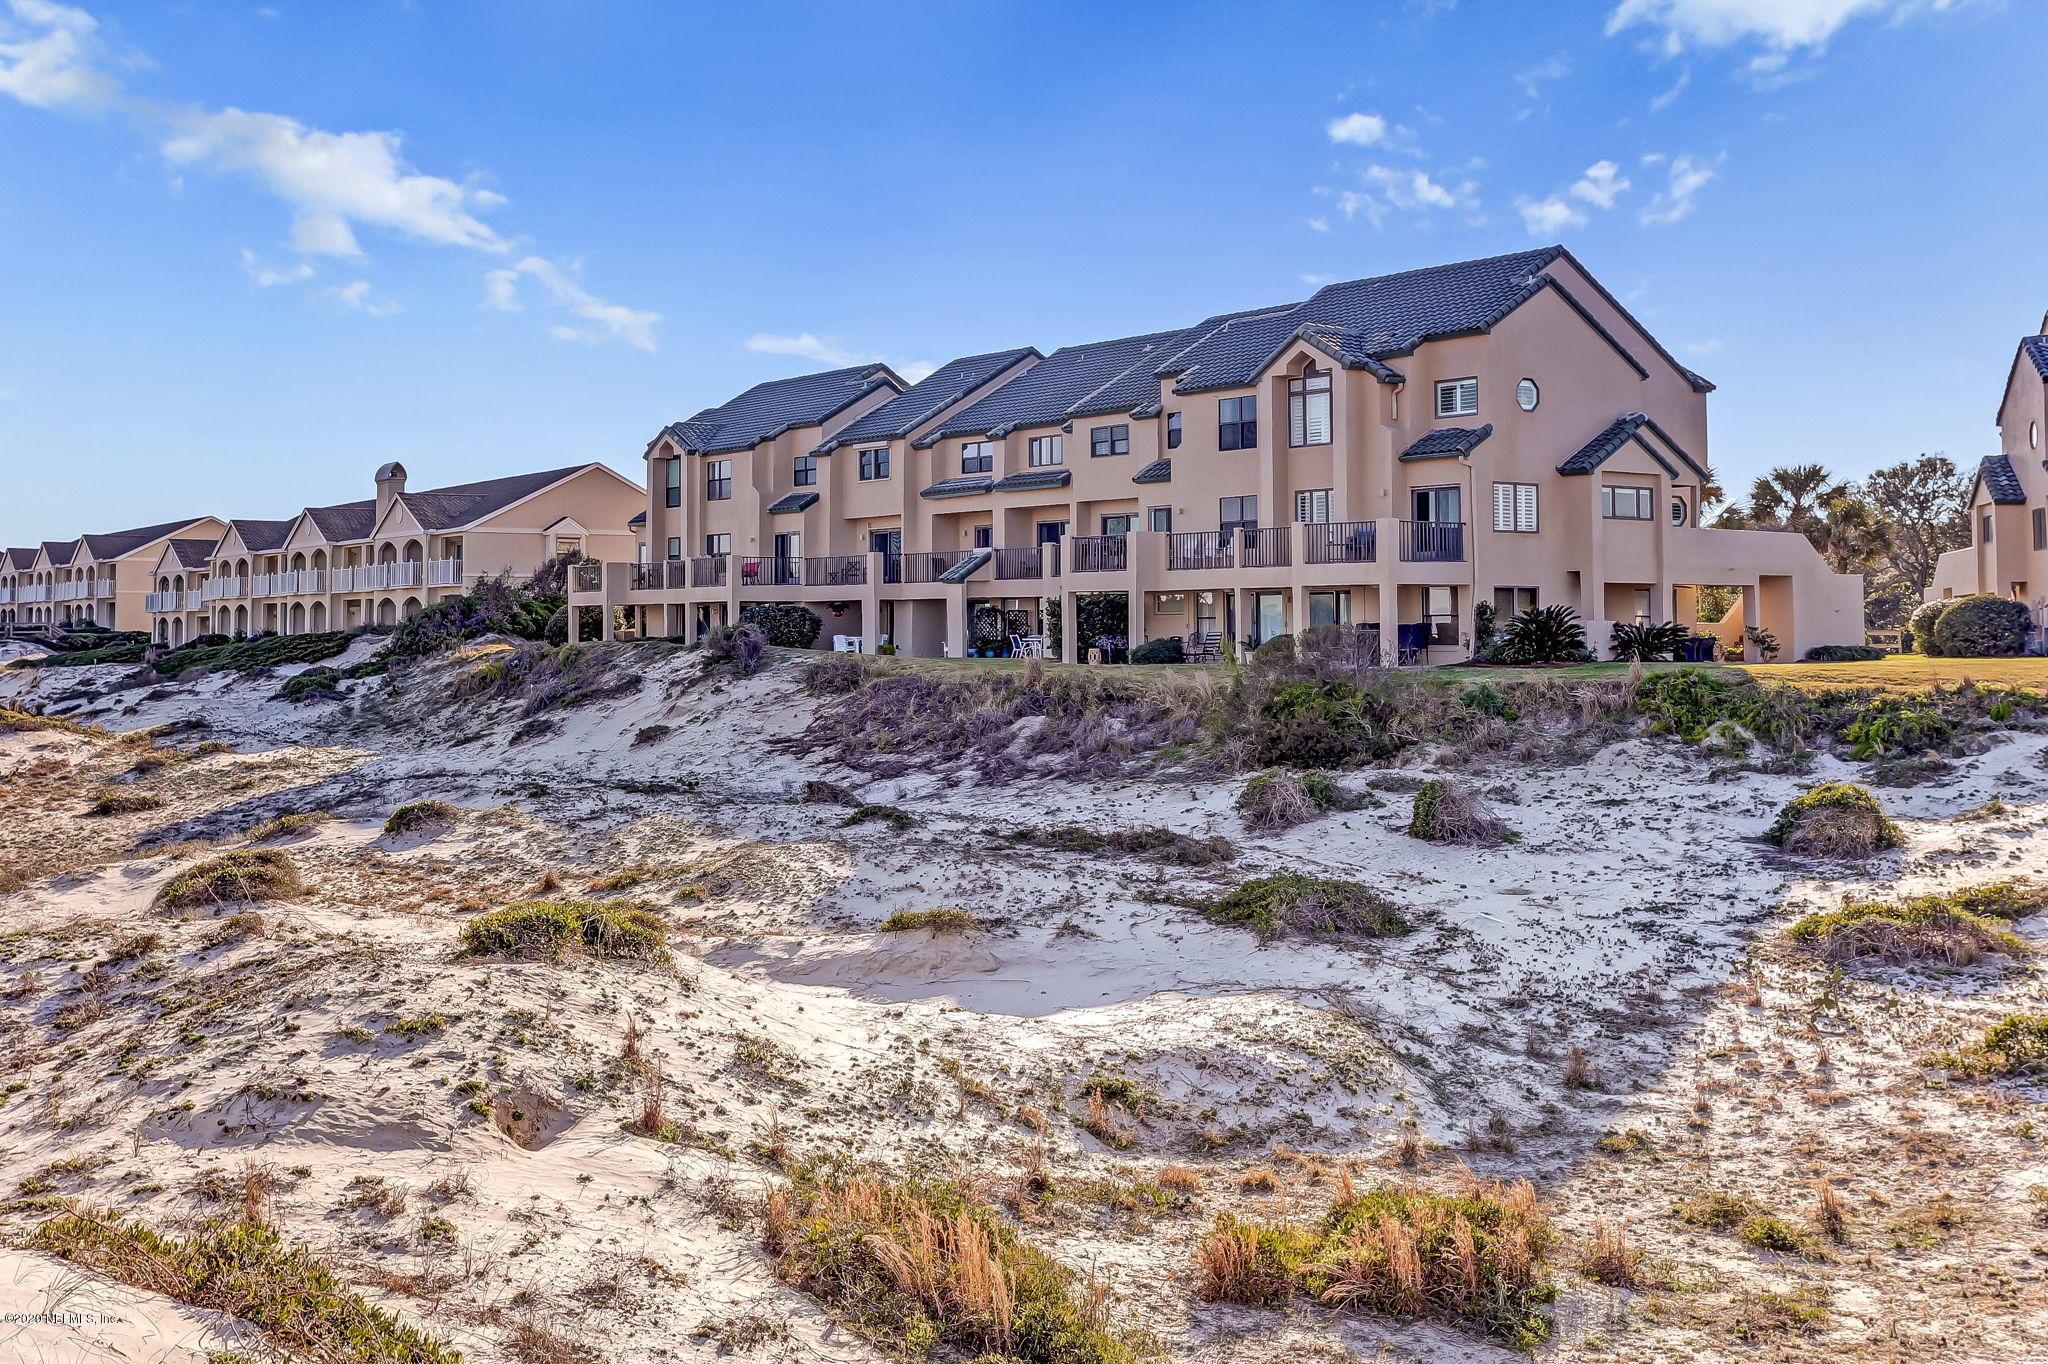 5010 SUMMER BEACH, FERNANDINA BEACH, FLORIDA 32034, 2 Bedrooms Bedrooms, ,2 BathroomsBathrooms,Residential,For sale,SUMMER BEACH,1082730